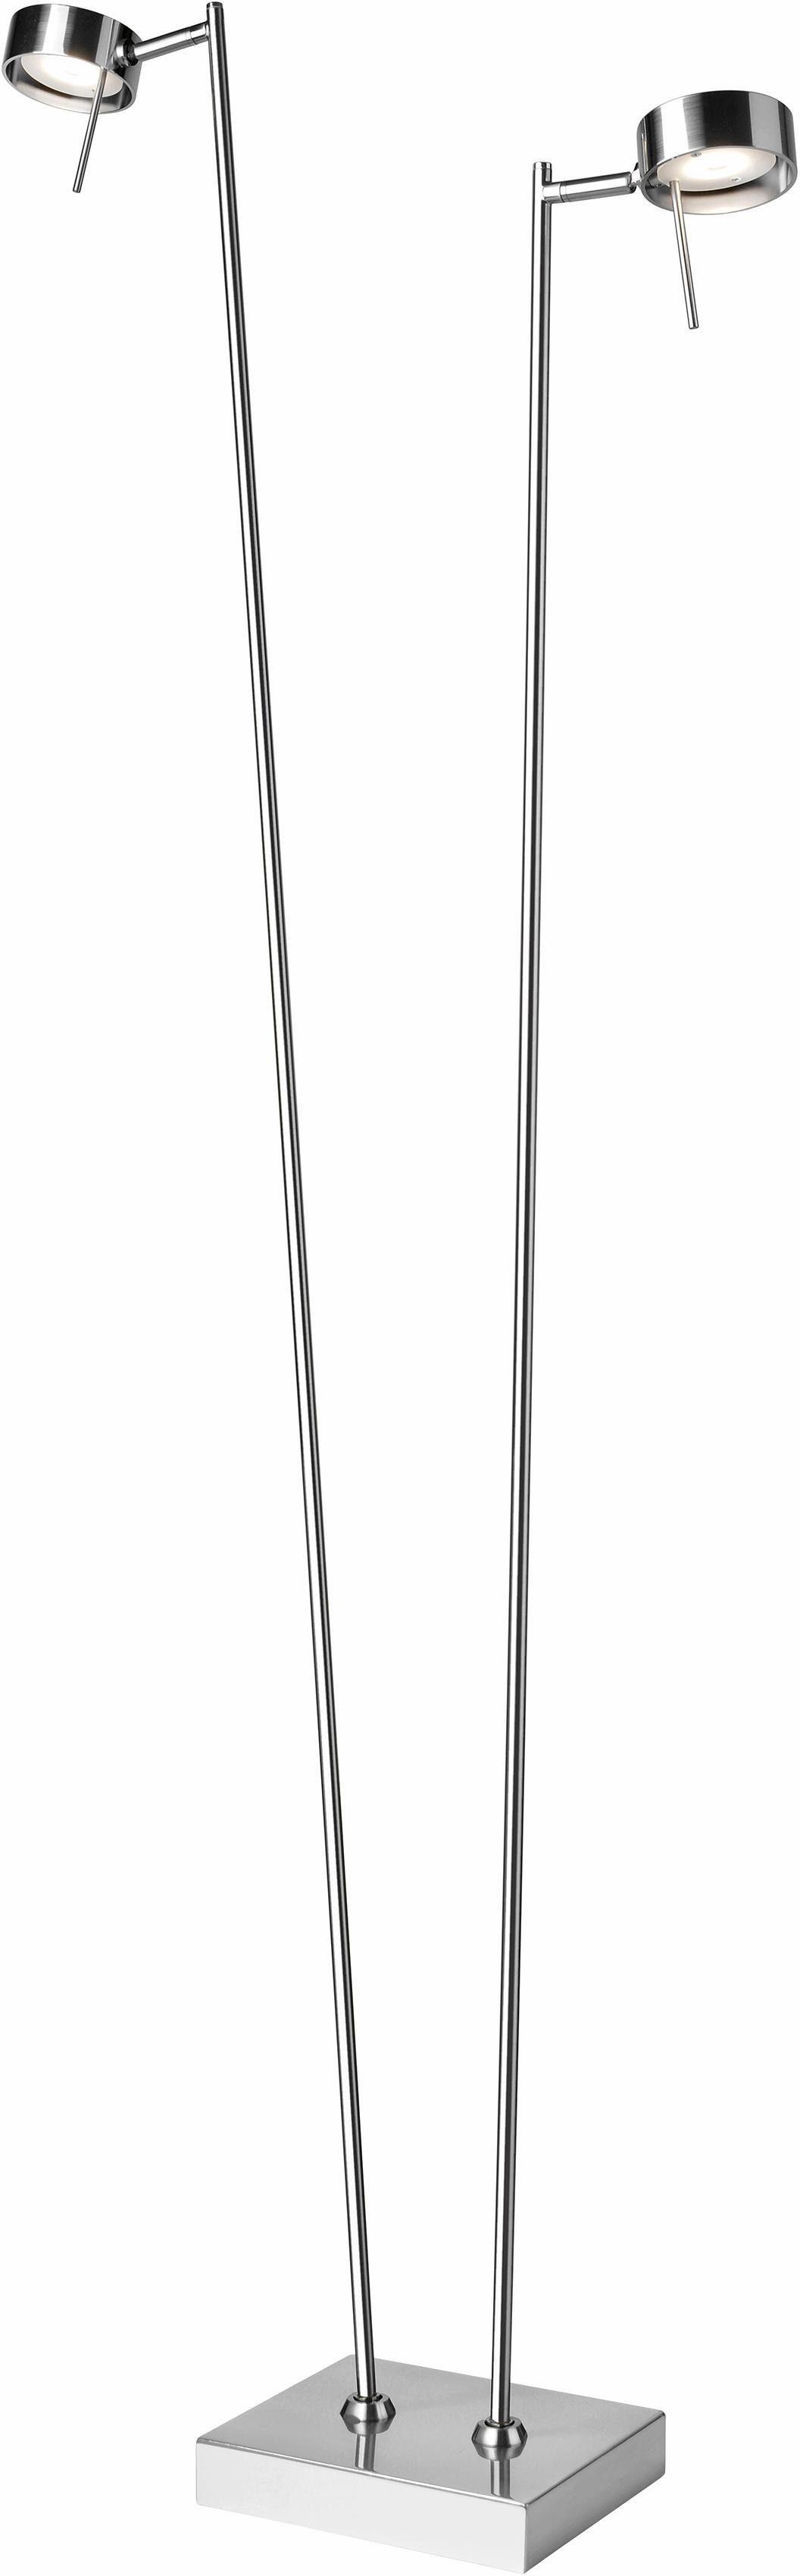 SOMPEX LED Stehlampe »BLING«, 2-flammig